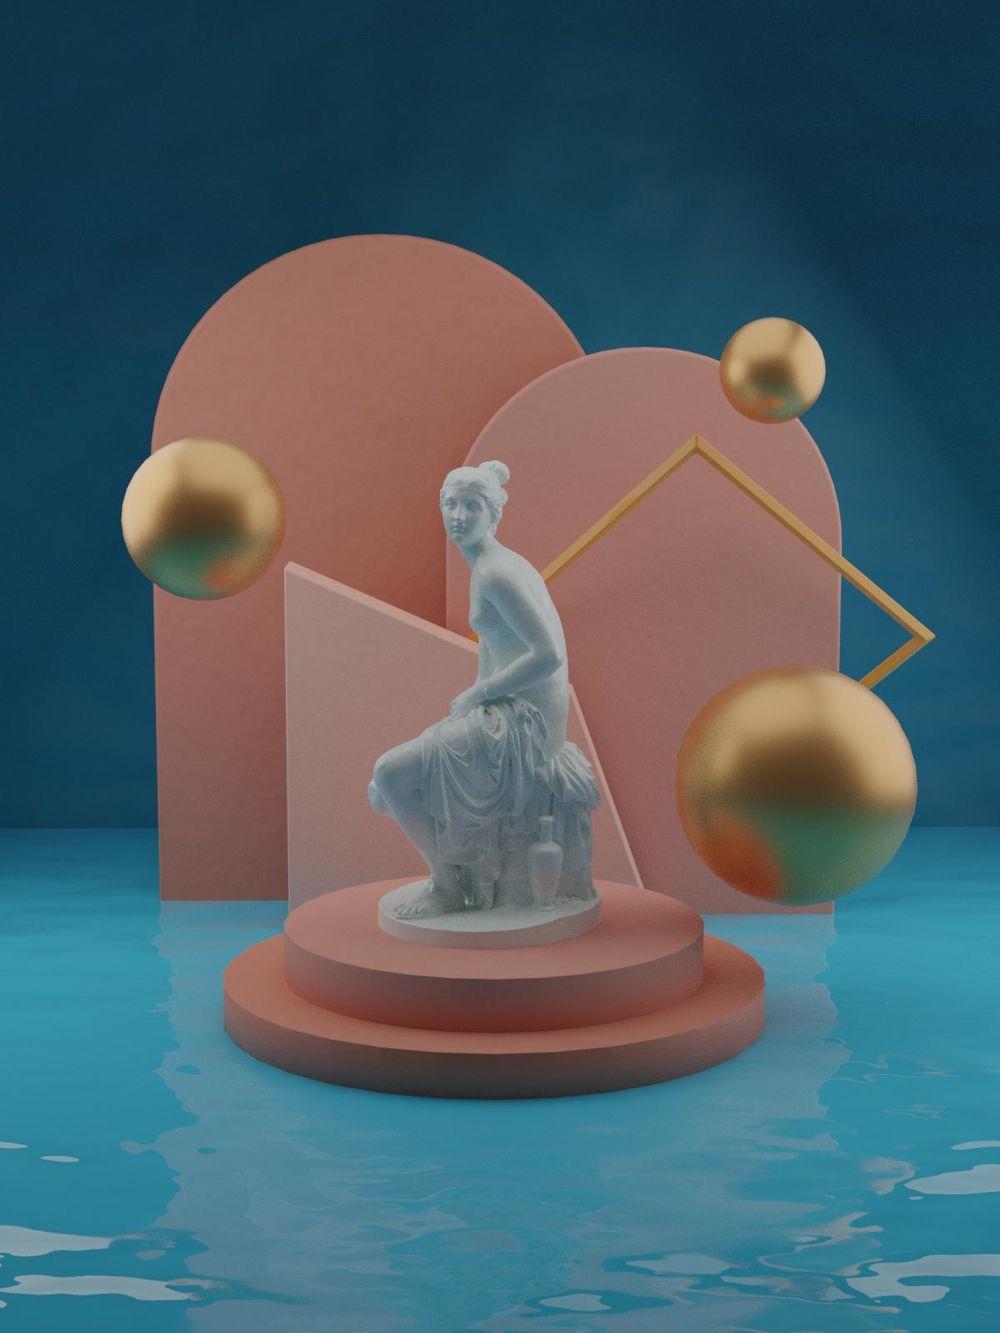 Blender Scene - image 1 - student project